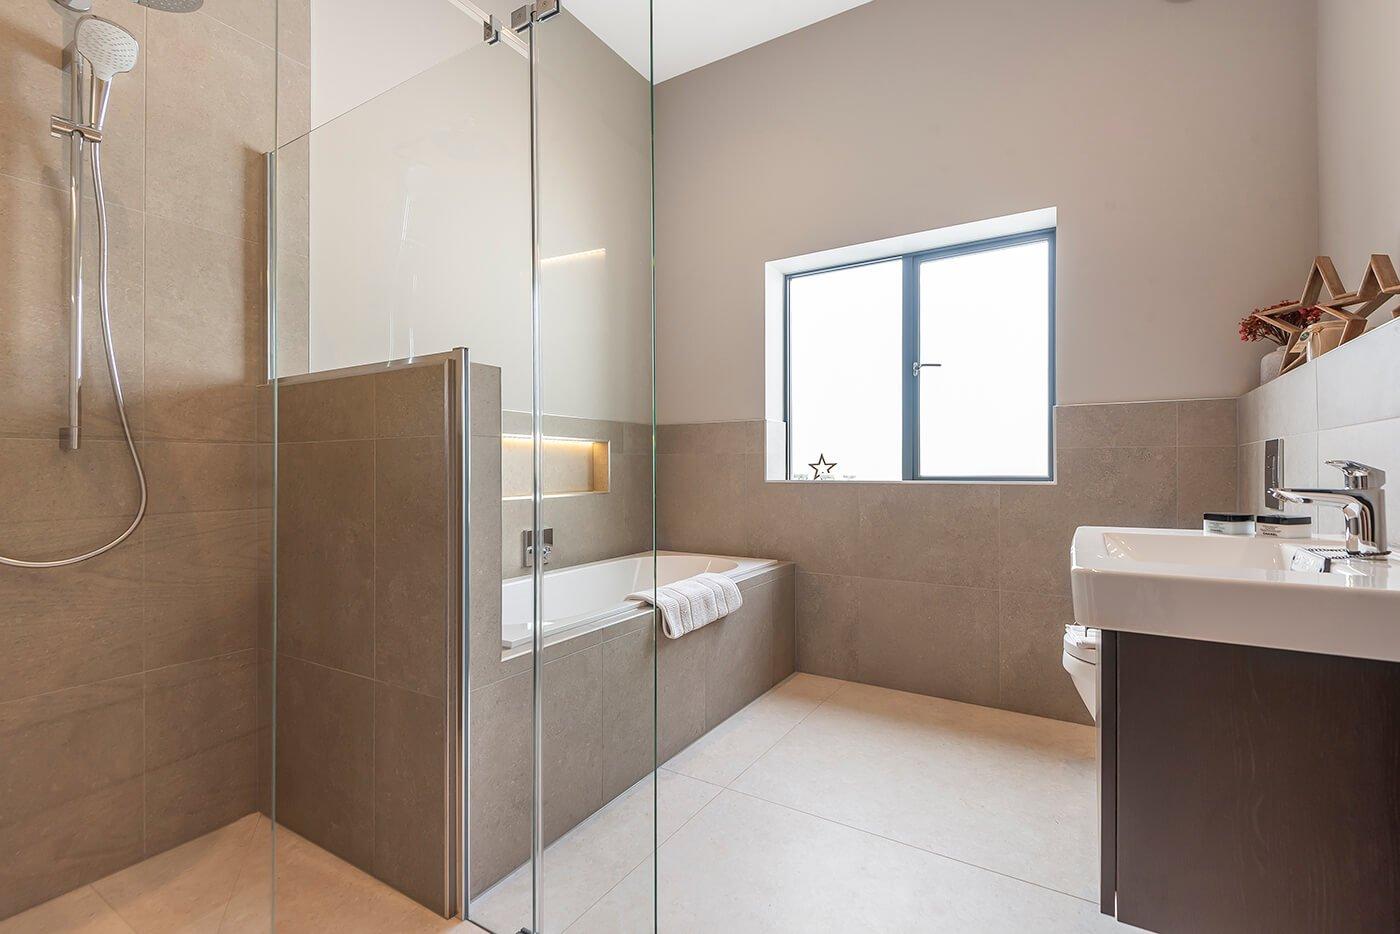 Harmby Homes - Barley Court, Staveley The Brocket bathroom